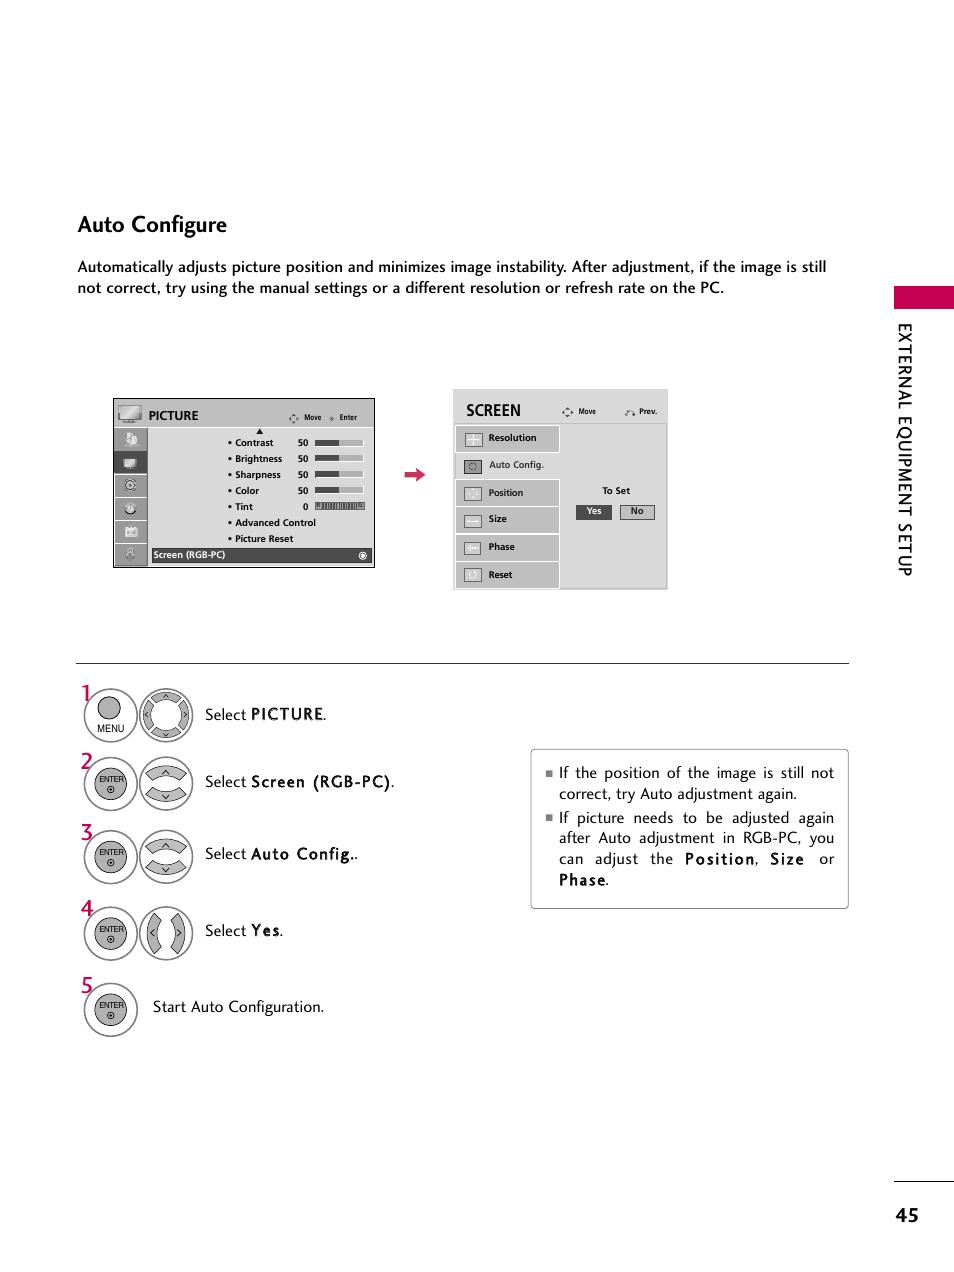 auto configure external eq uipment setup lg 47lh30 user manual rh manualsdir com LG 47LH30 Replacement Screen Panel lg tv 47lh30 manual